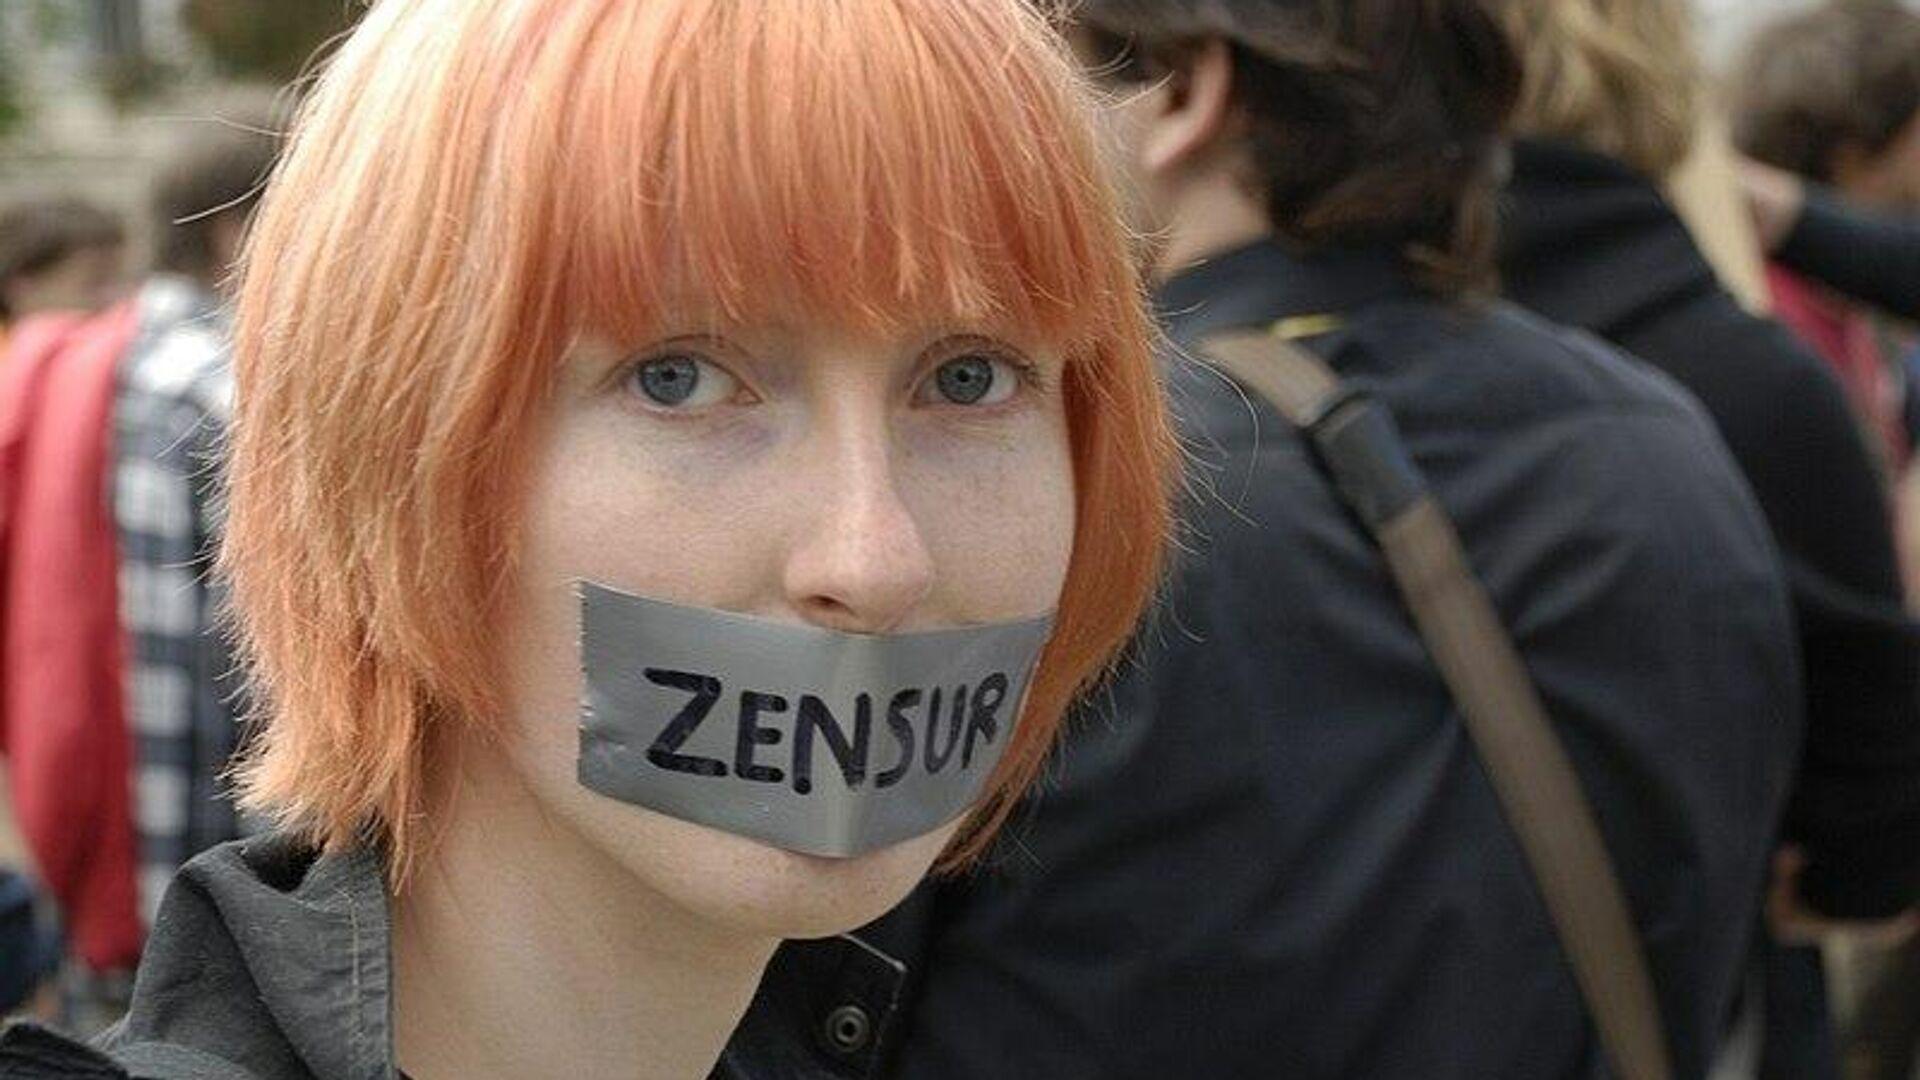 Zensur (Symbolbild) - SNA, 1920, 04.10.2021